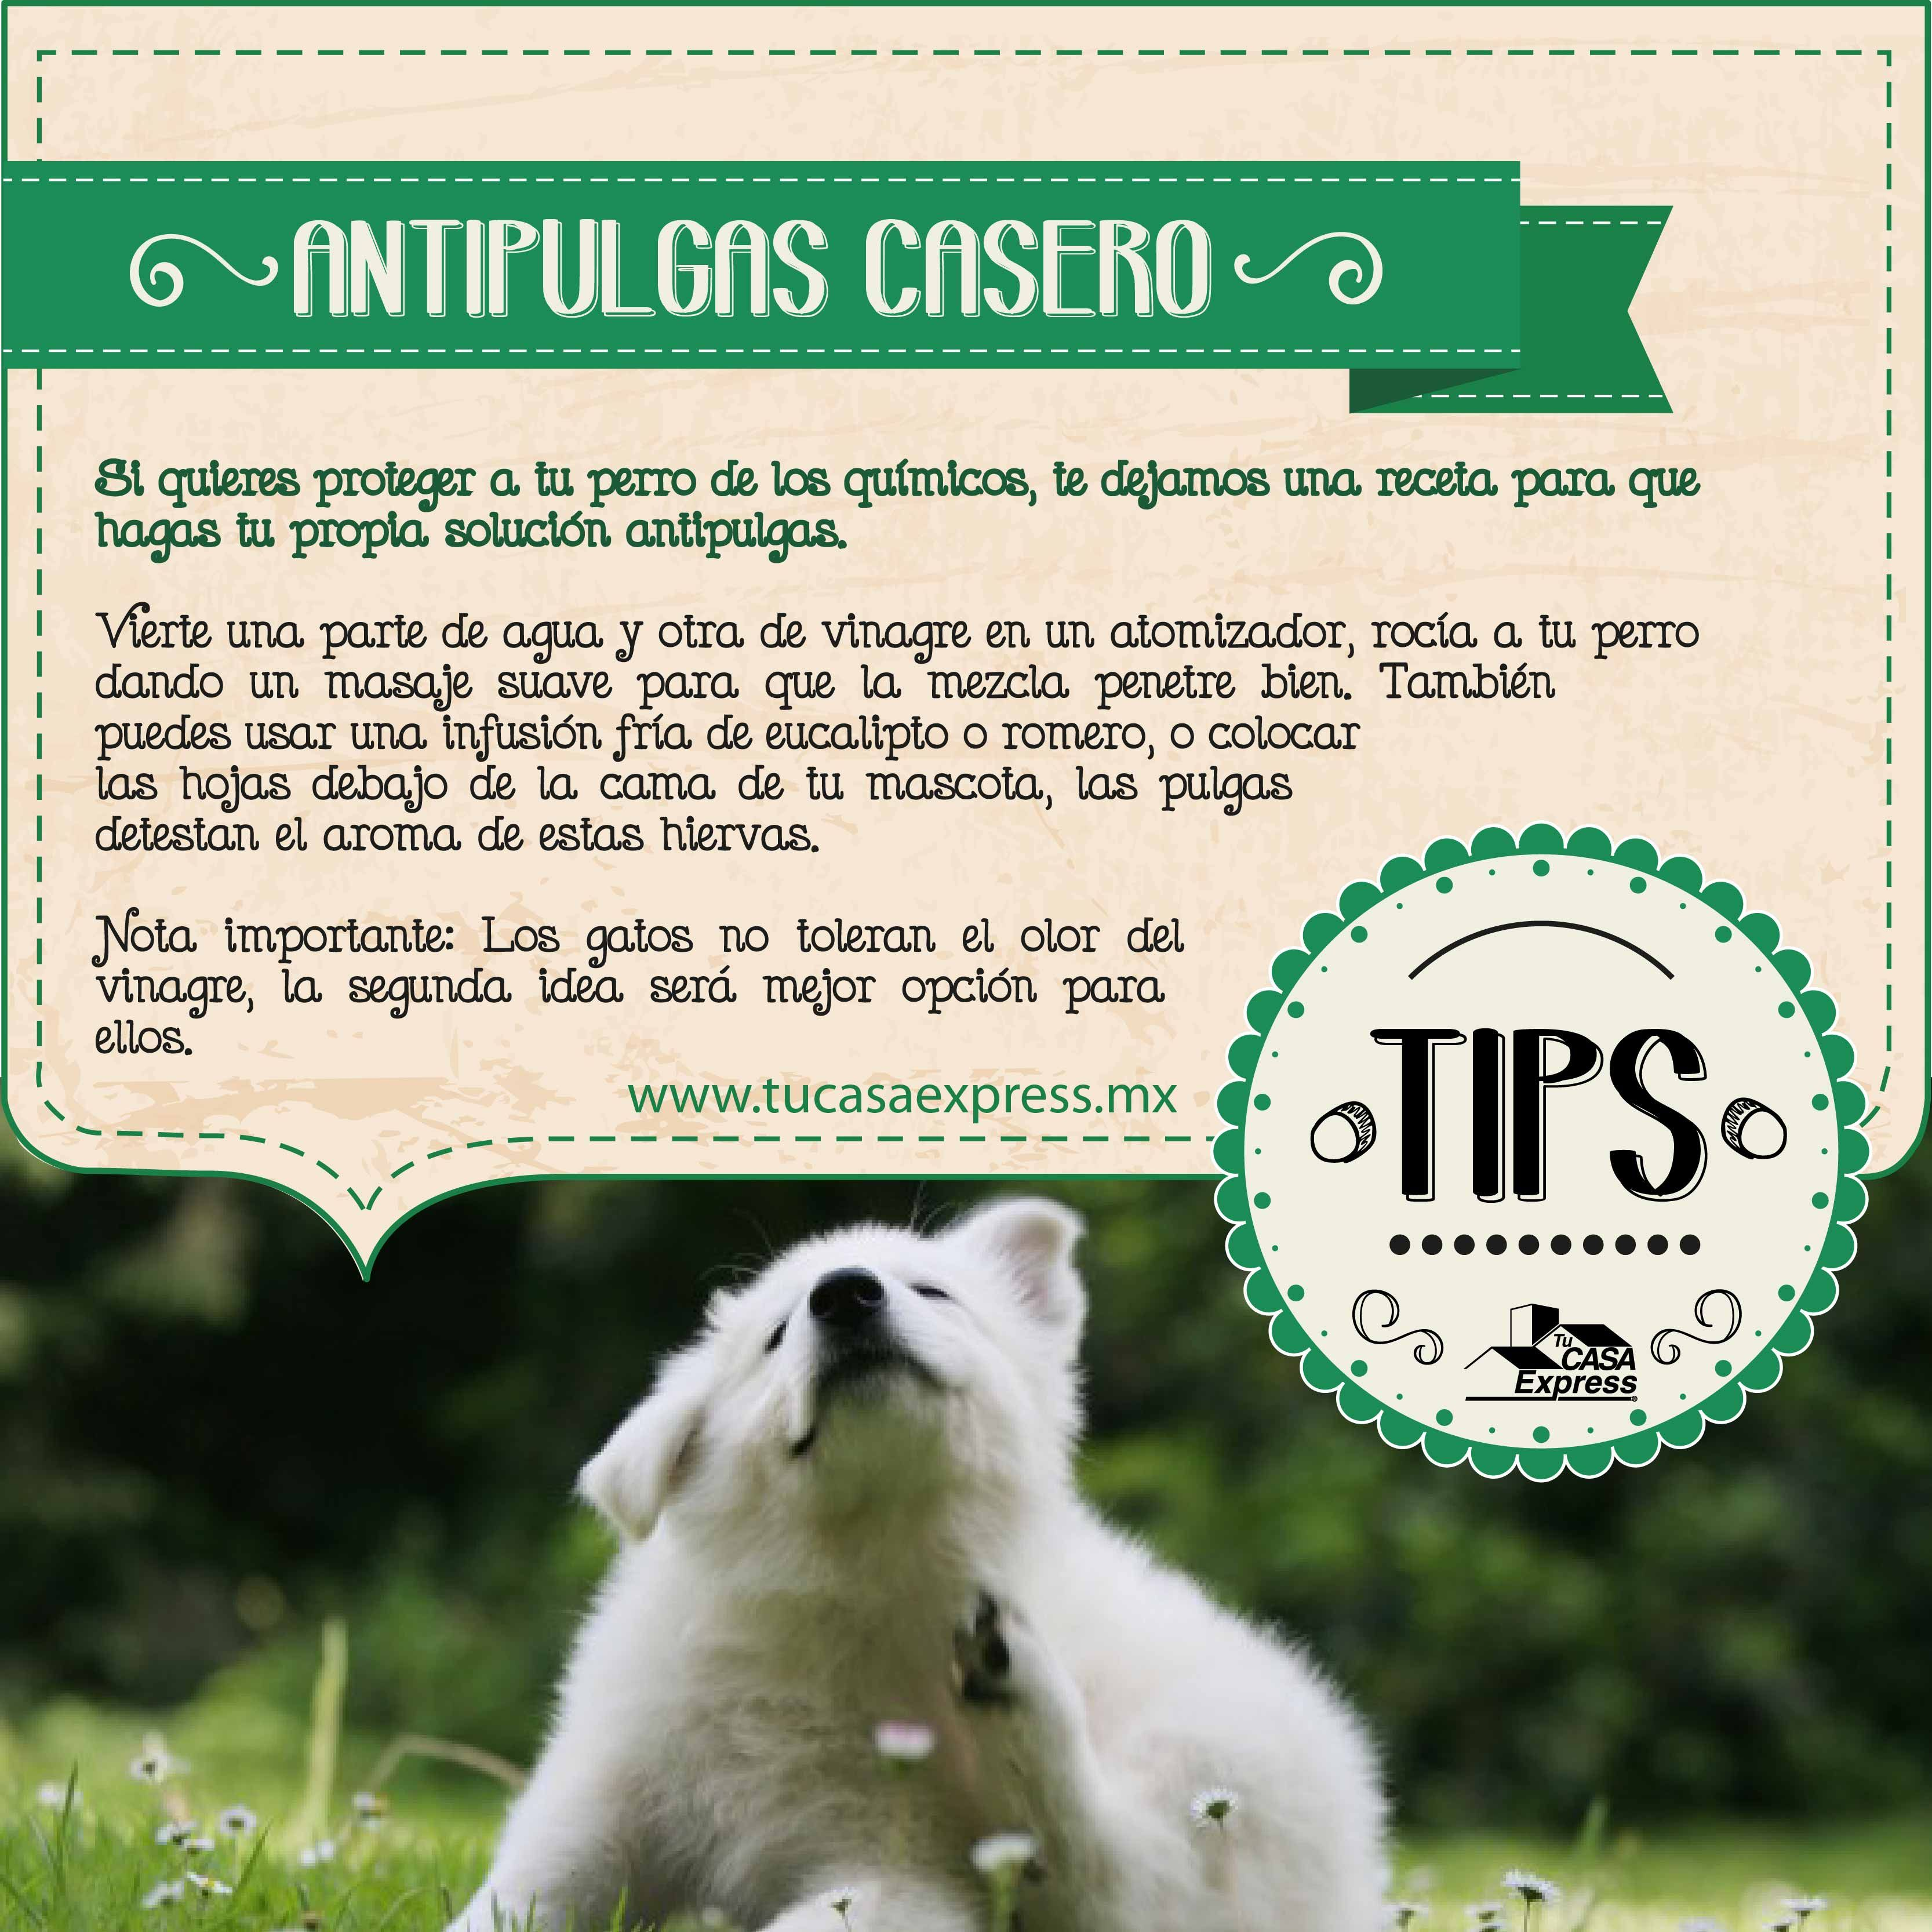 17 best ideas about antipulgas on pinterest antipulgas - Acabar con las pulgas en casa ...